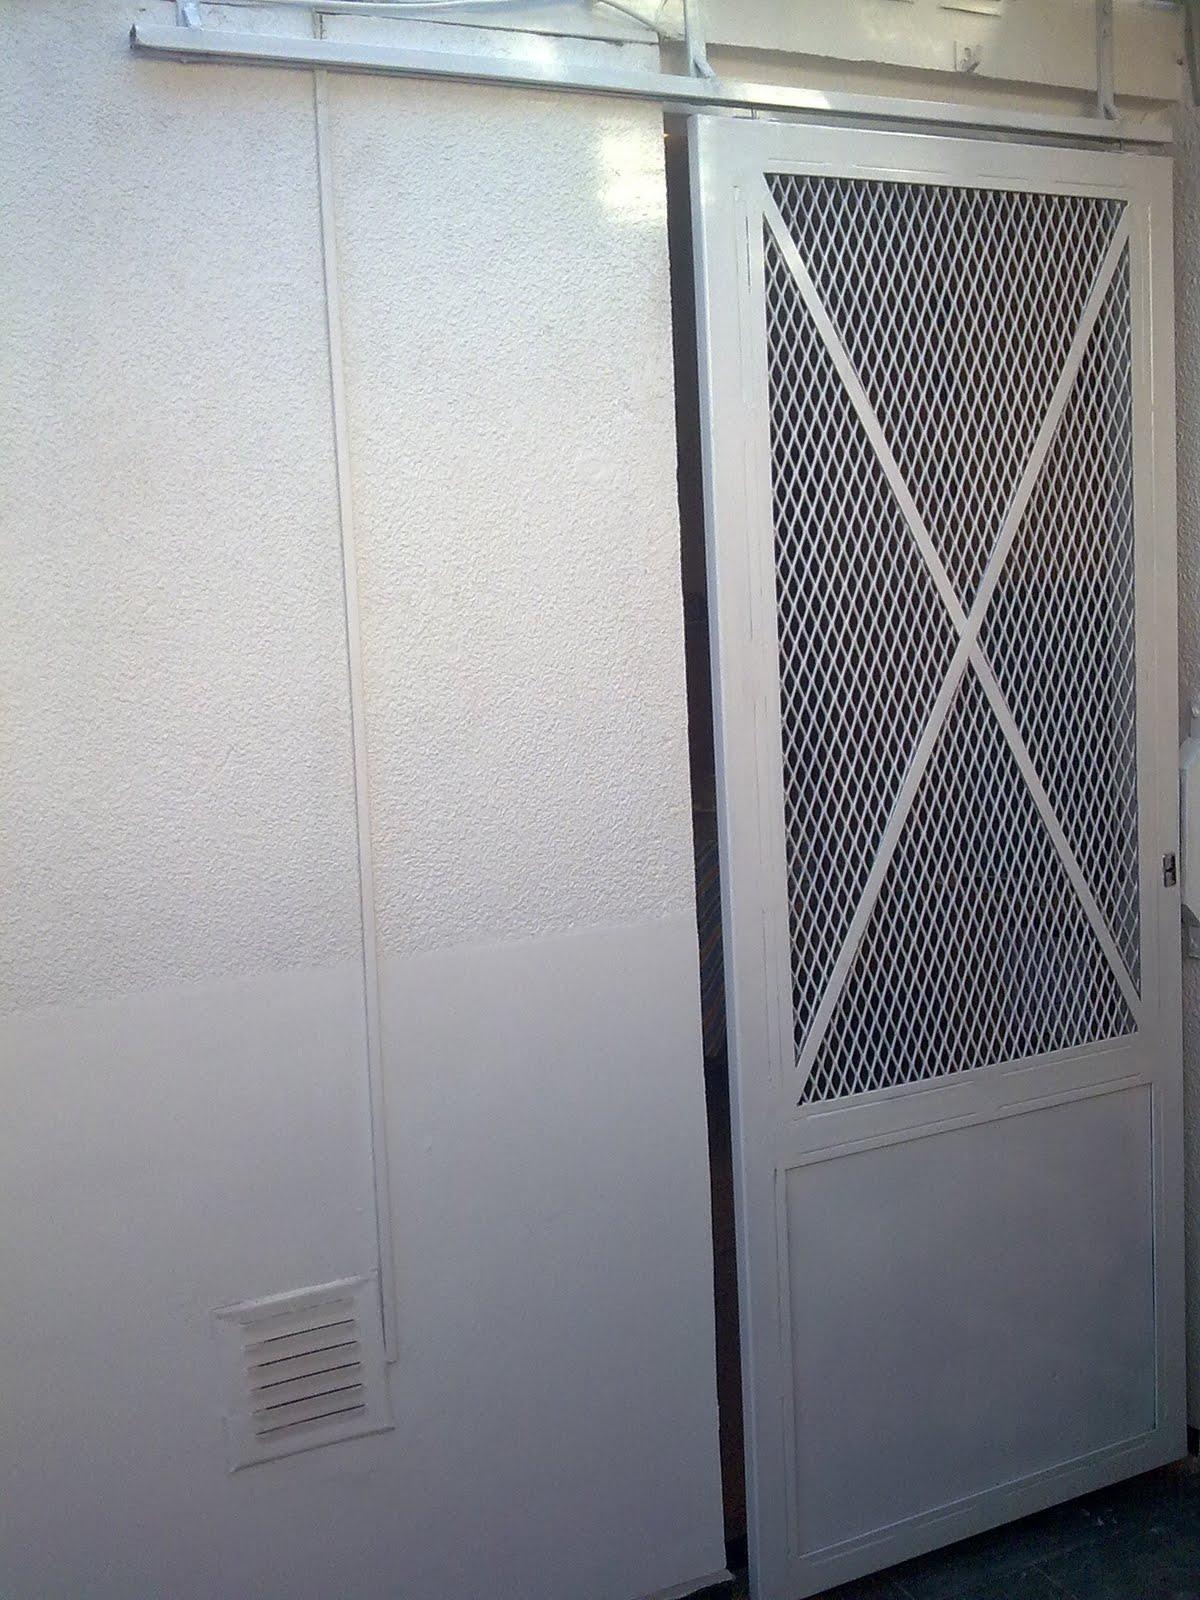 Eko metalurgica puerta reja modelo designe corrediza for Puertas corredizas de metal